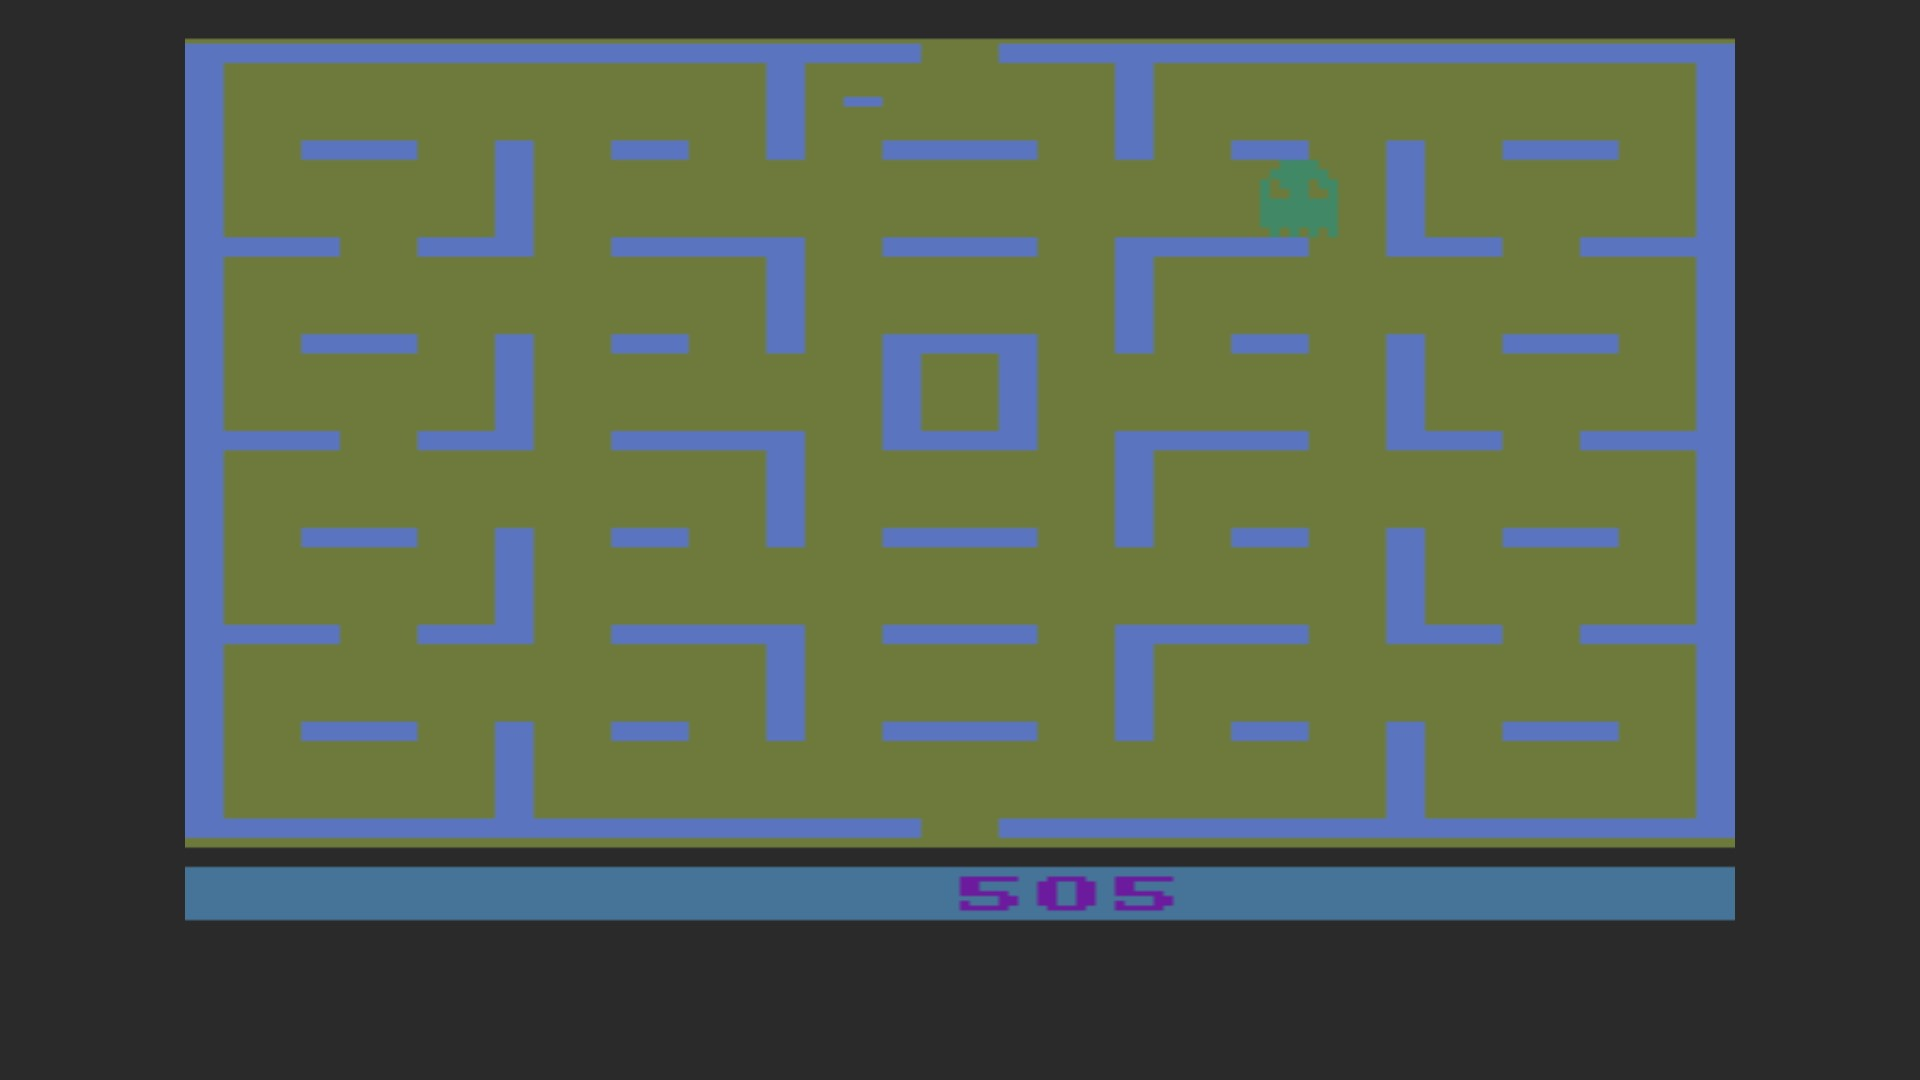 AkinNahtanoj: Pac-Man (Atari 2600 Emulated Expert/A Mode) 505 points on 2020-10-18 07:52:54